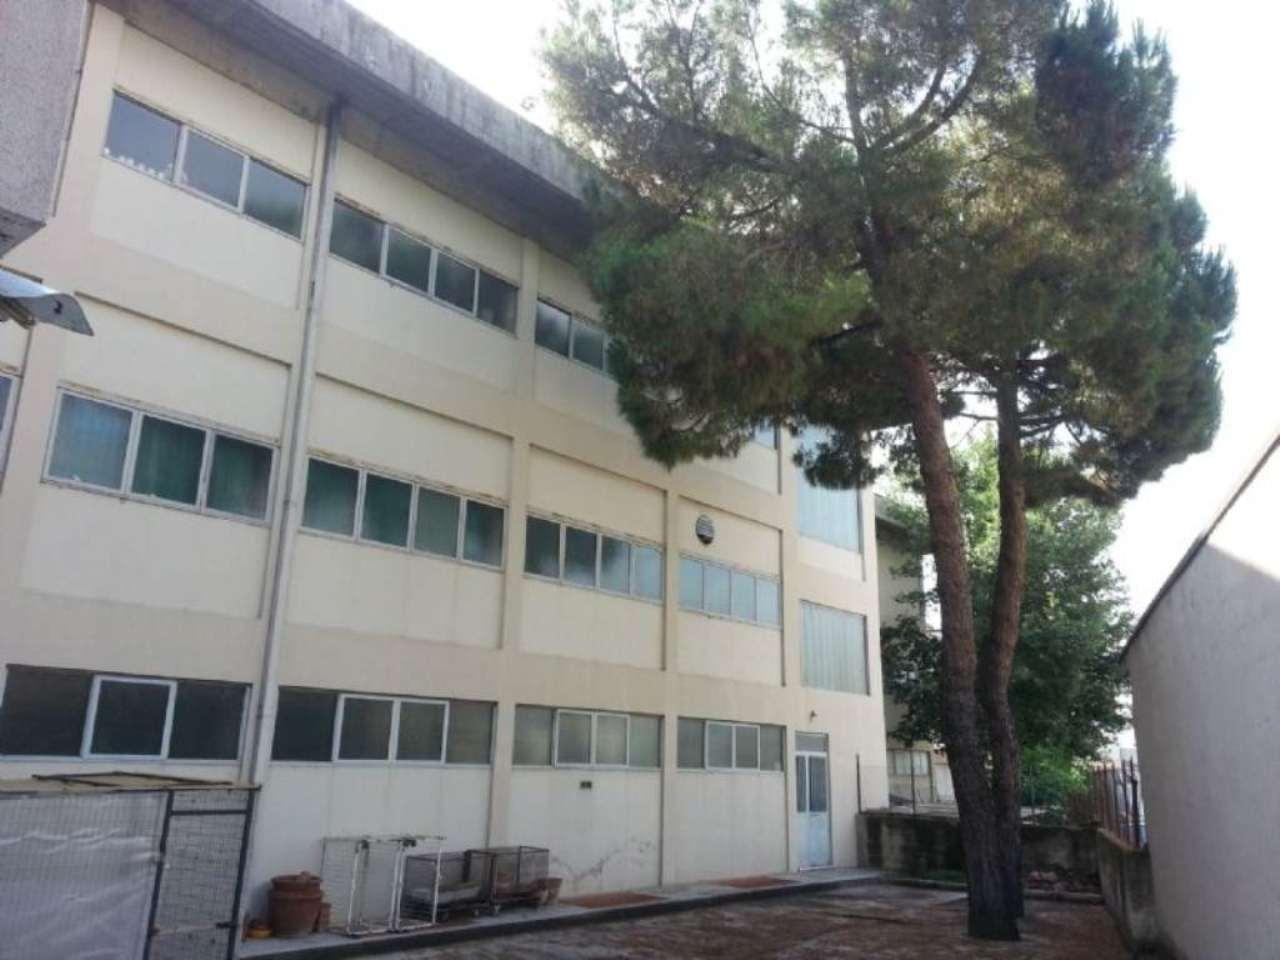 Capannone in vendita a Negrar, 9999 locali, Trattative riservate | CambioCasa.it